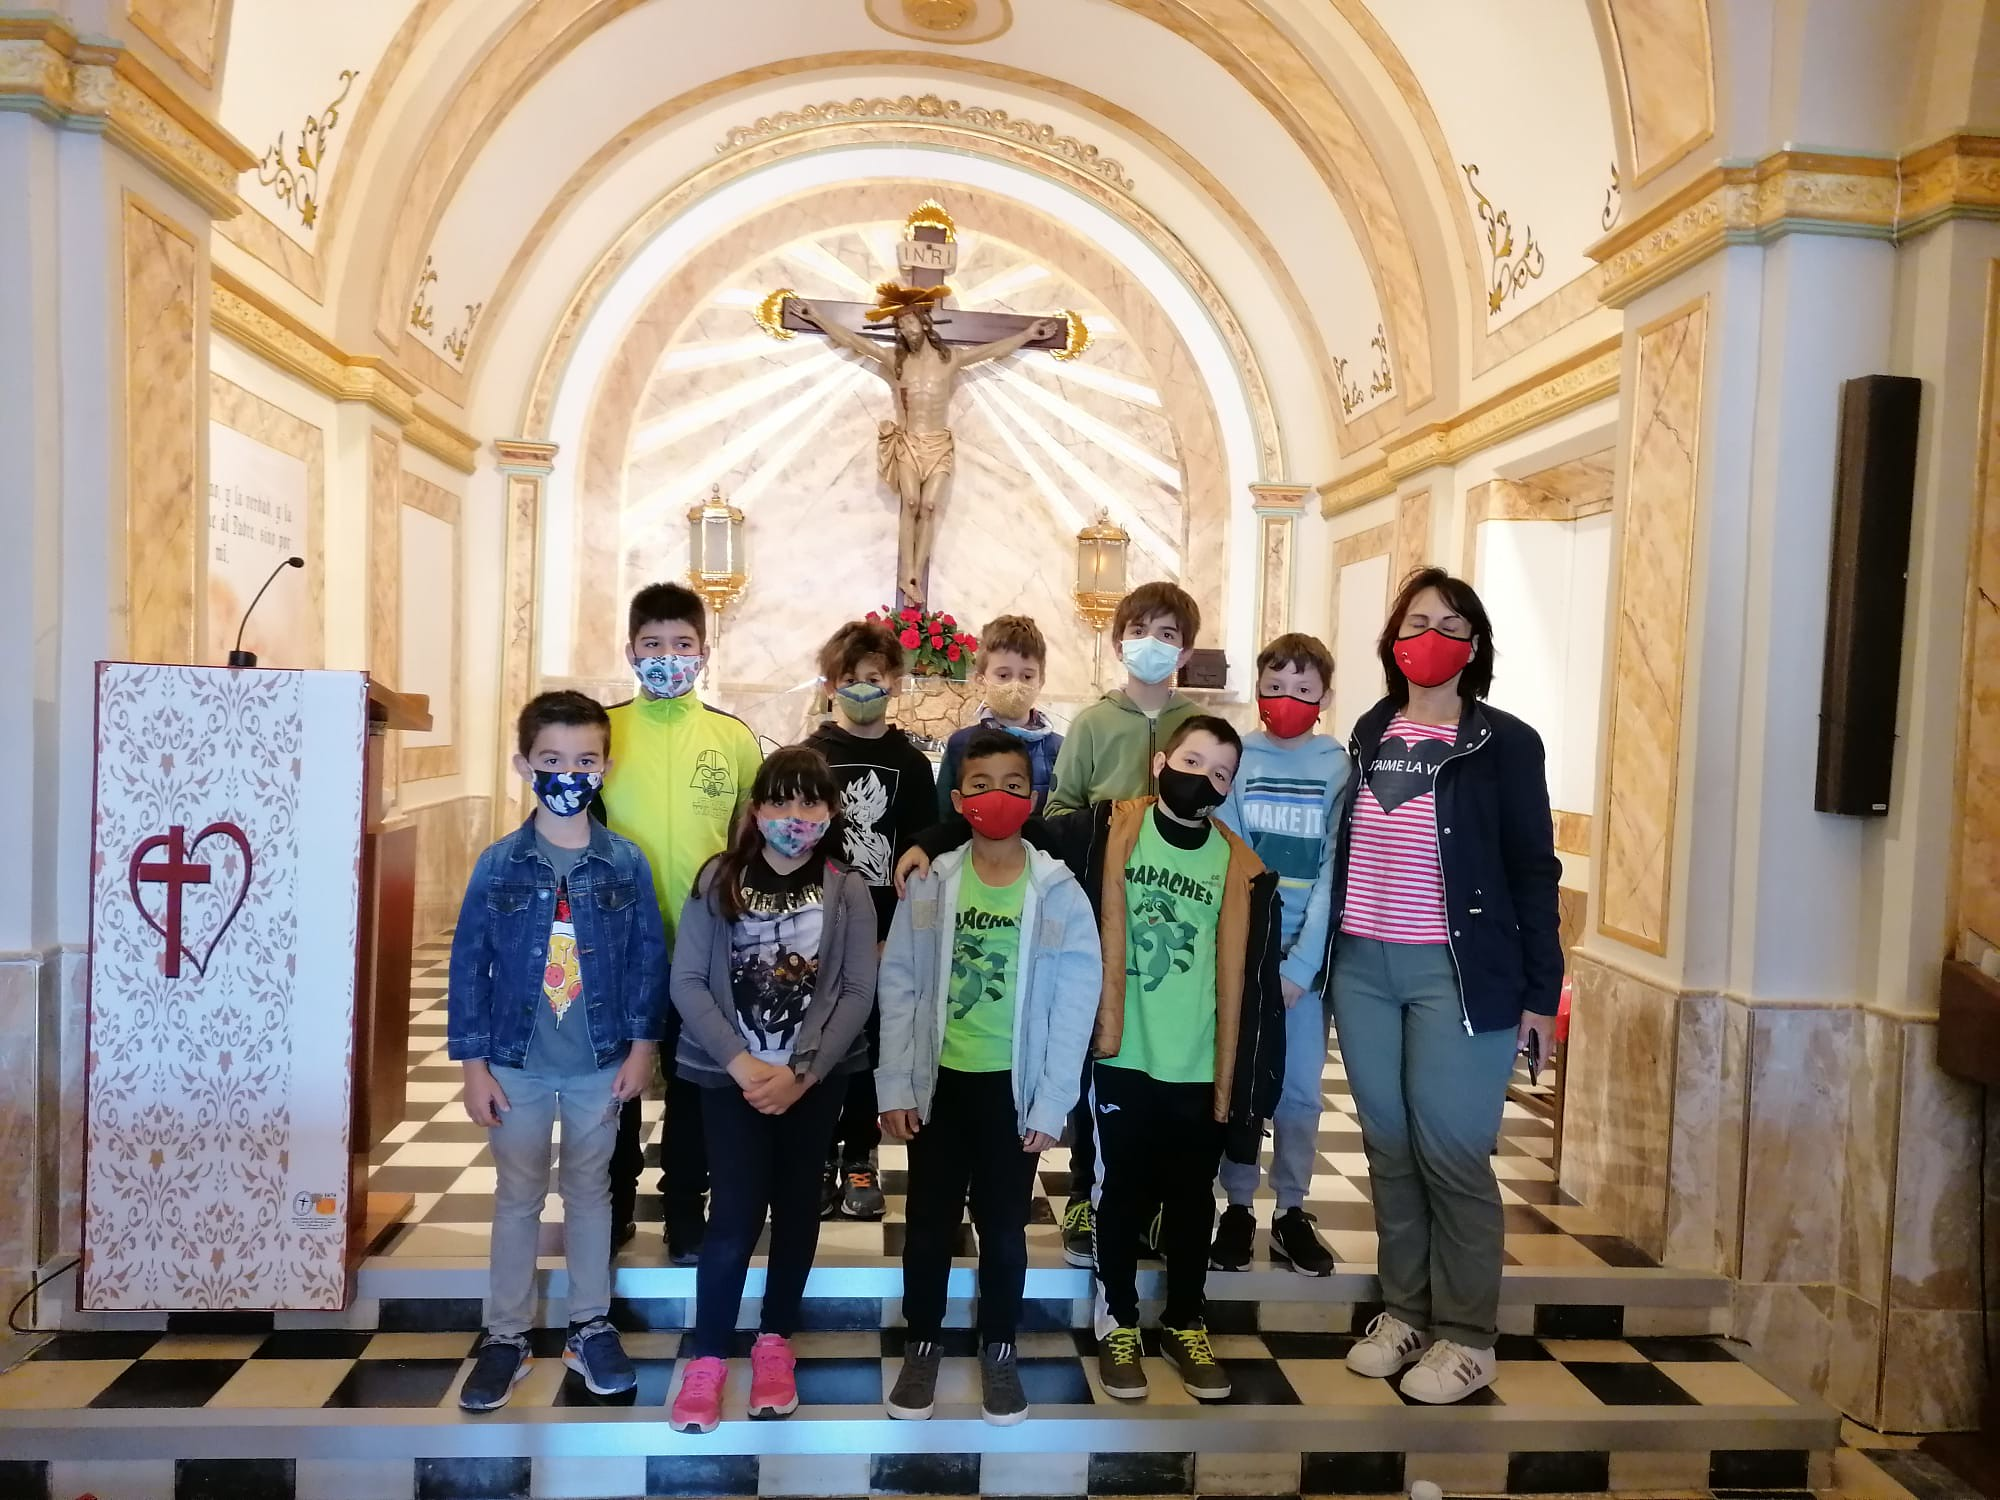 (2021-05-11) - Visita ermita alumnos Laura,3º B, Reina Sofia - Maria Isabel Berenquer Brotons - (02)